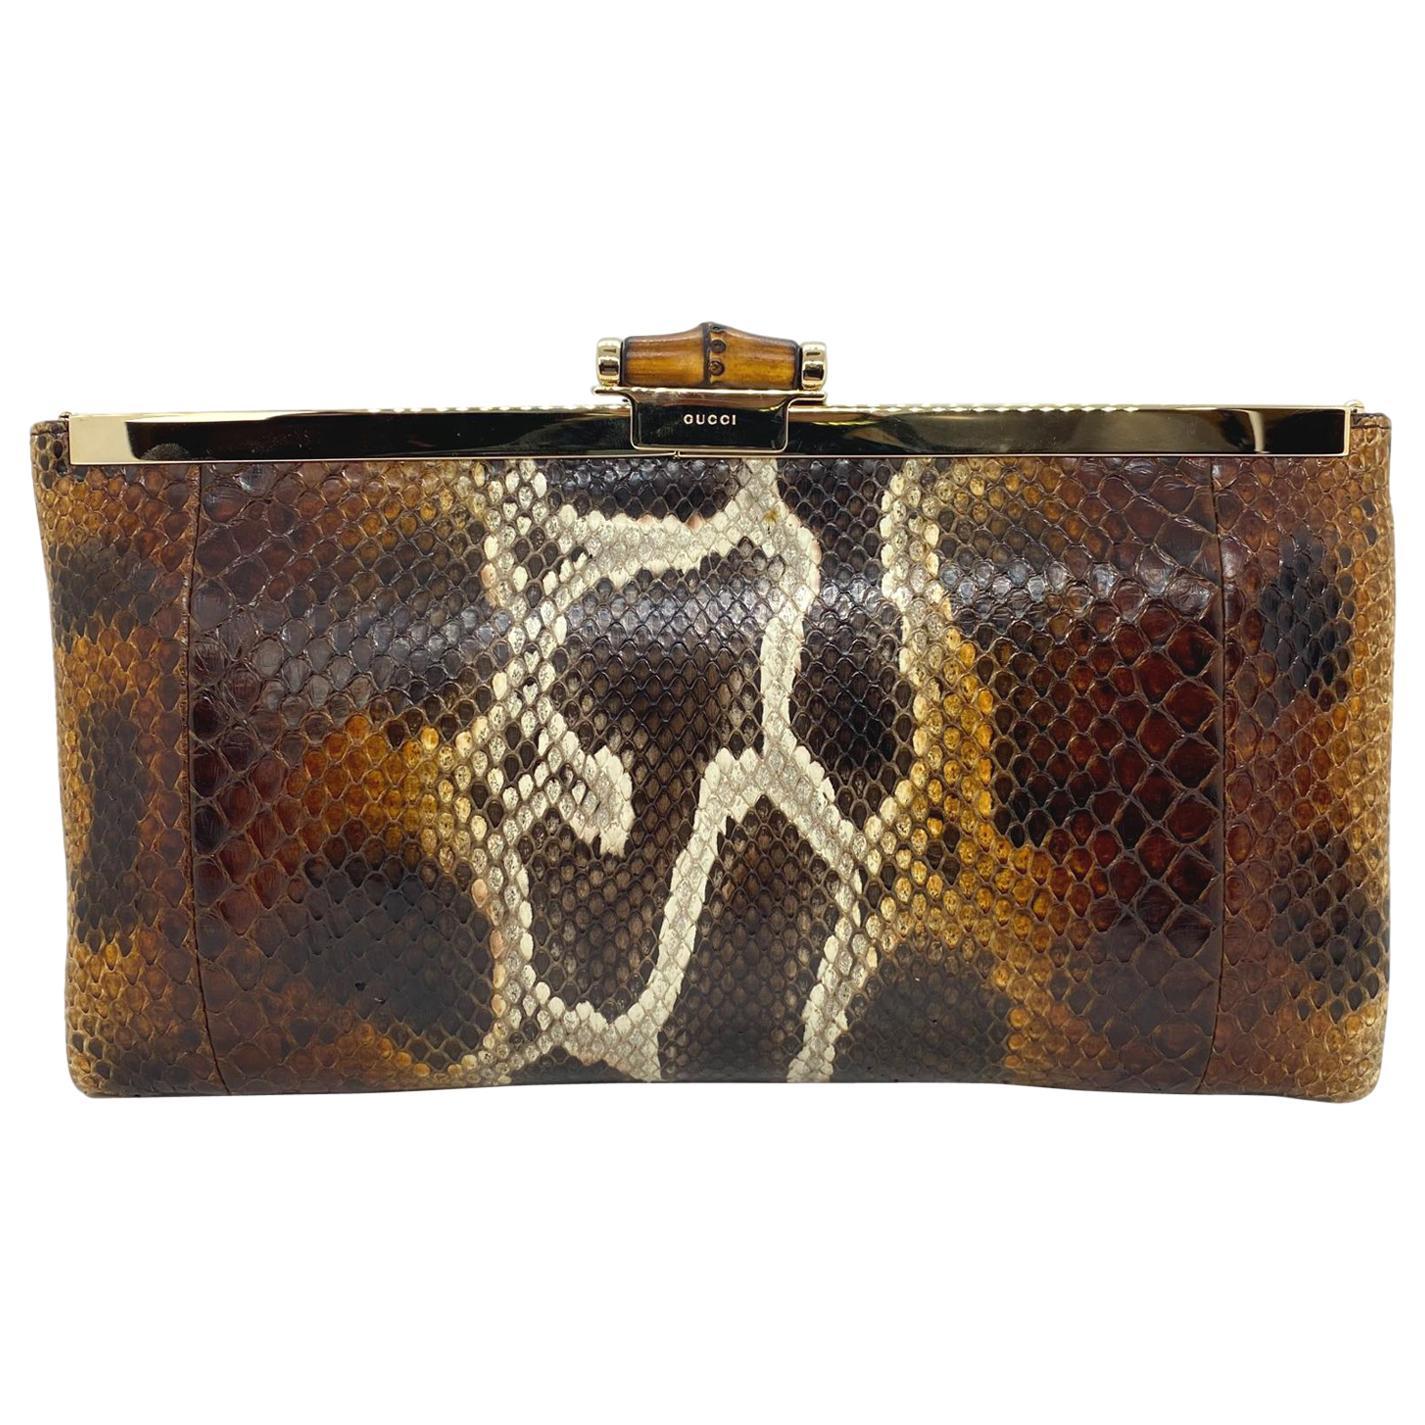 Limited Edition Gucci Tom Ford Python Minaudière Runway Frame Bag